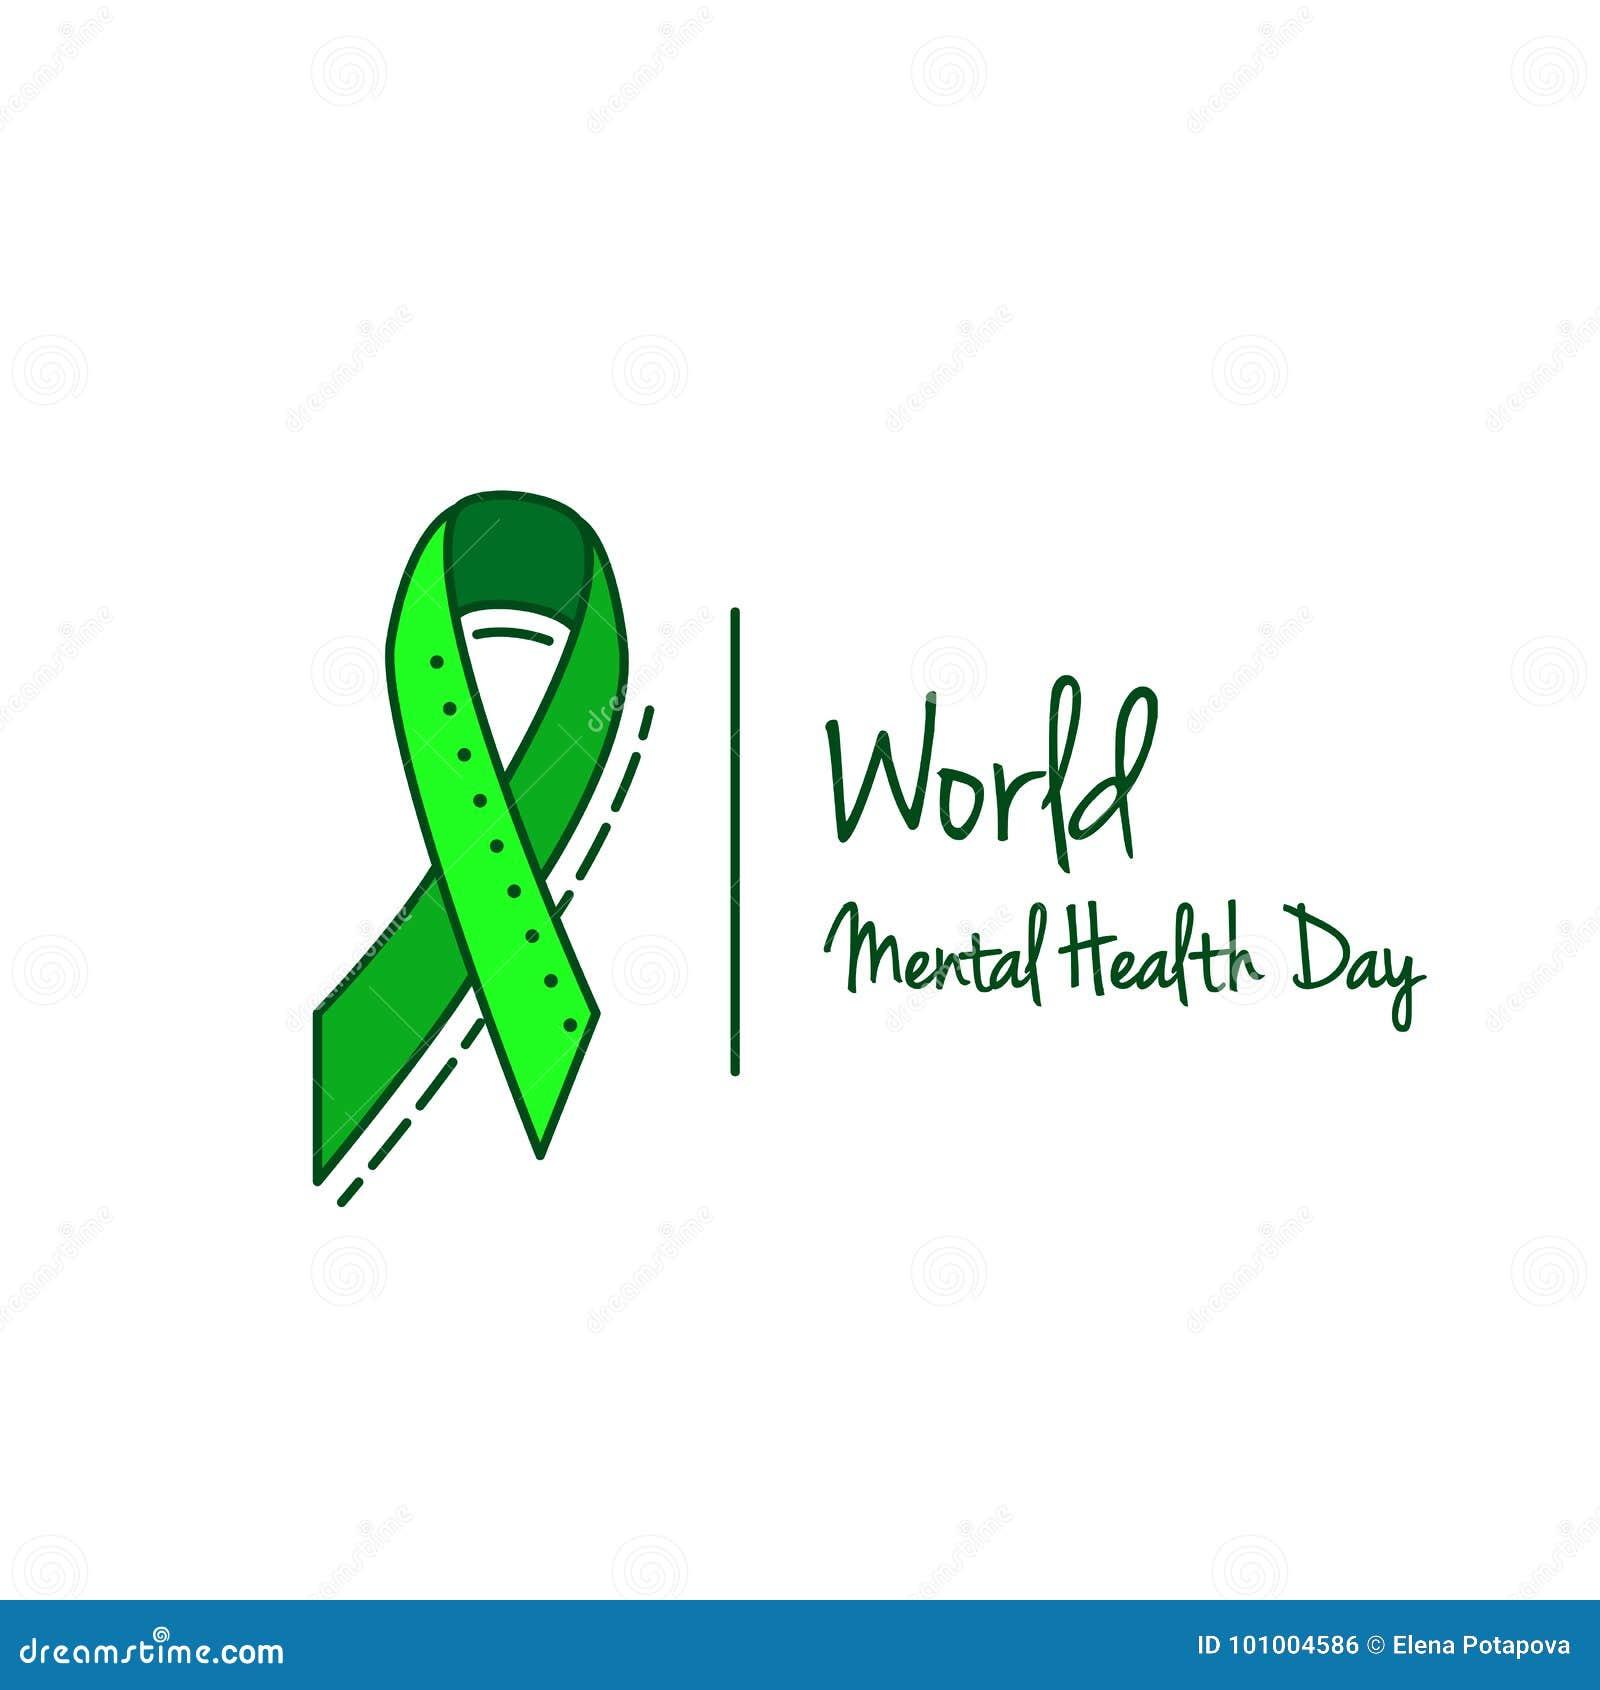 Download Mental Health Hepatitis B And Liver Cancer Or Non Hodgkin Lymphoma Awareness Green